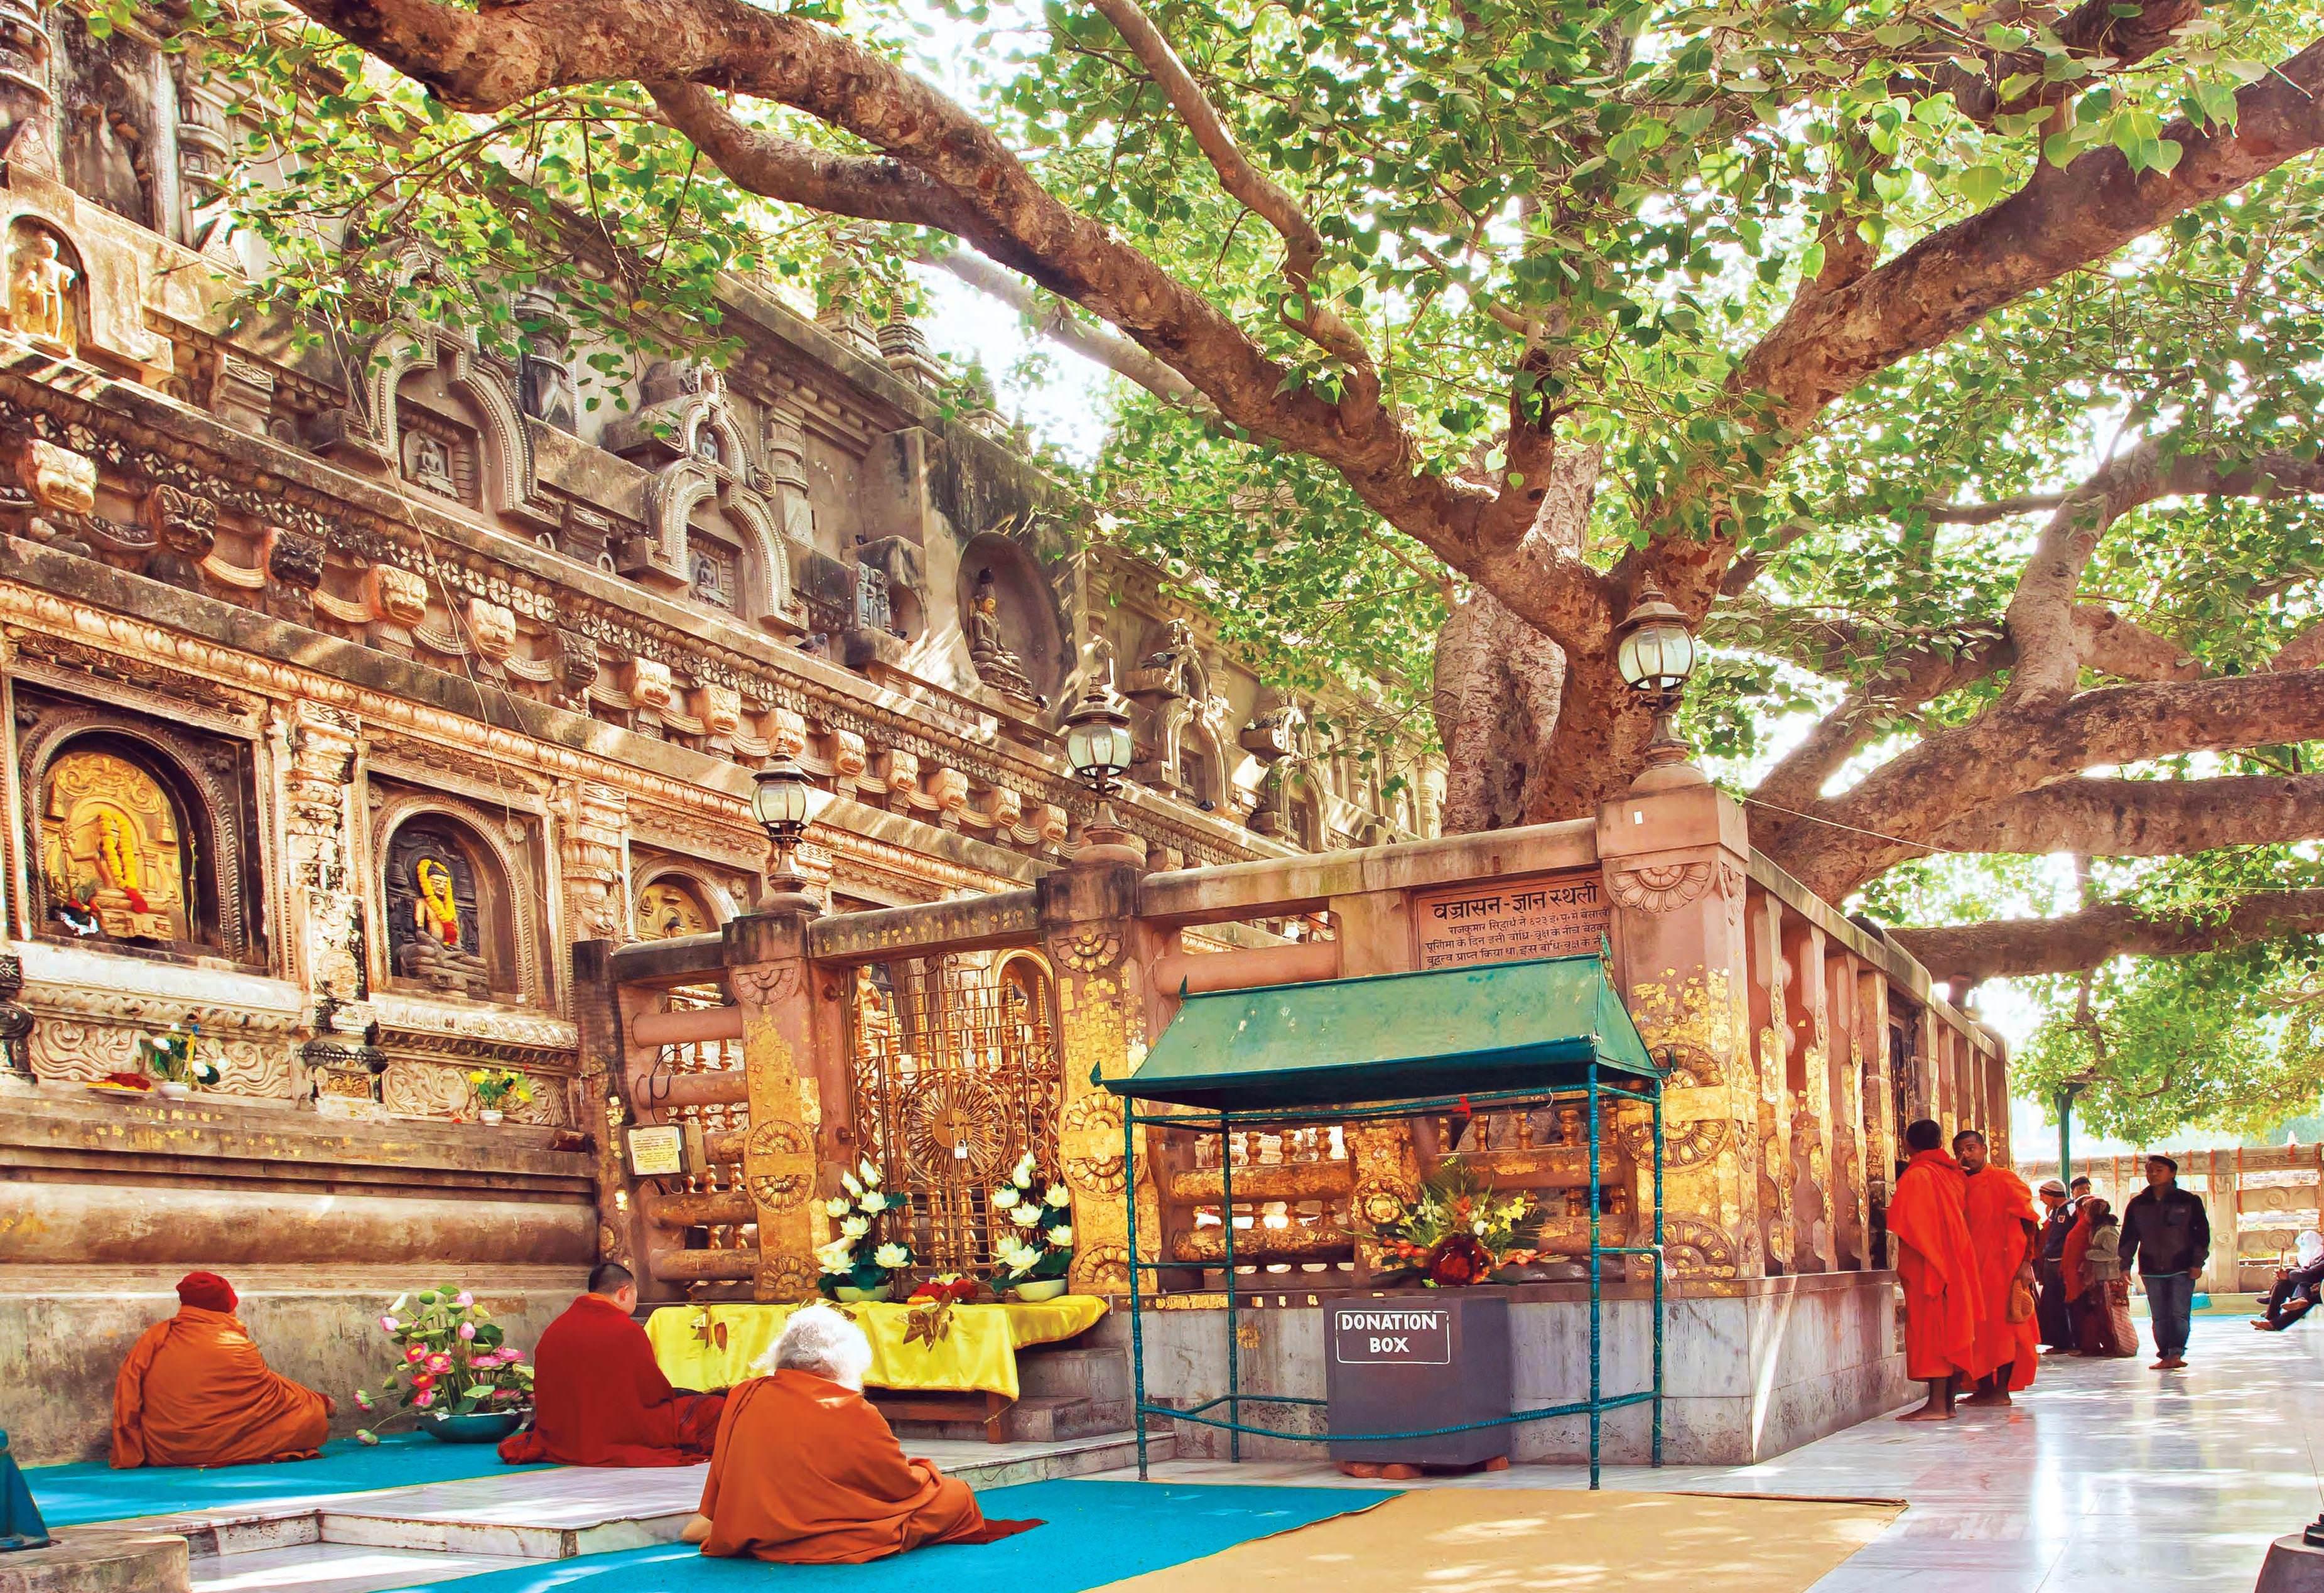 Following Buddha's Footprints